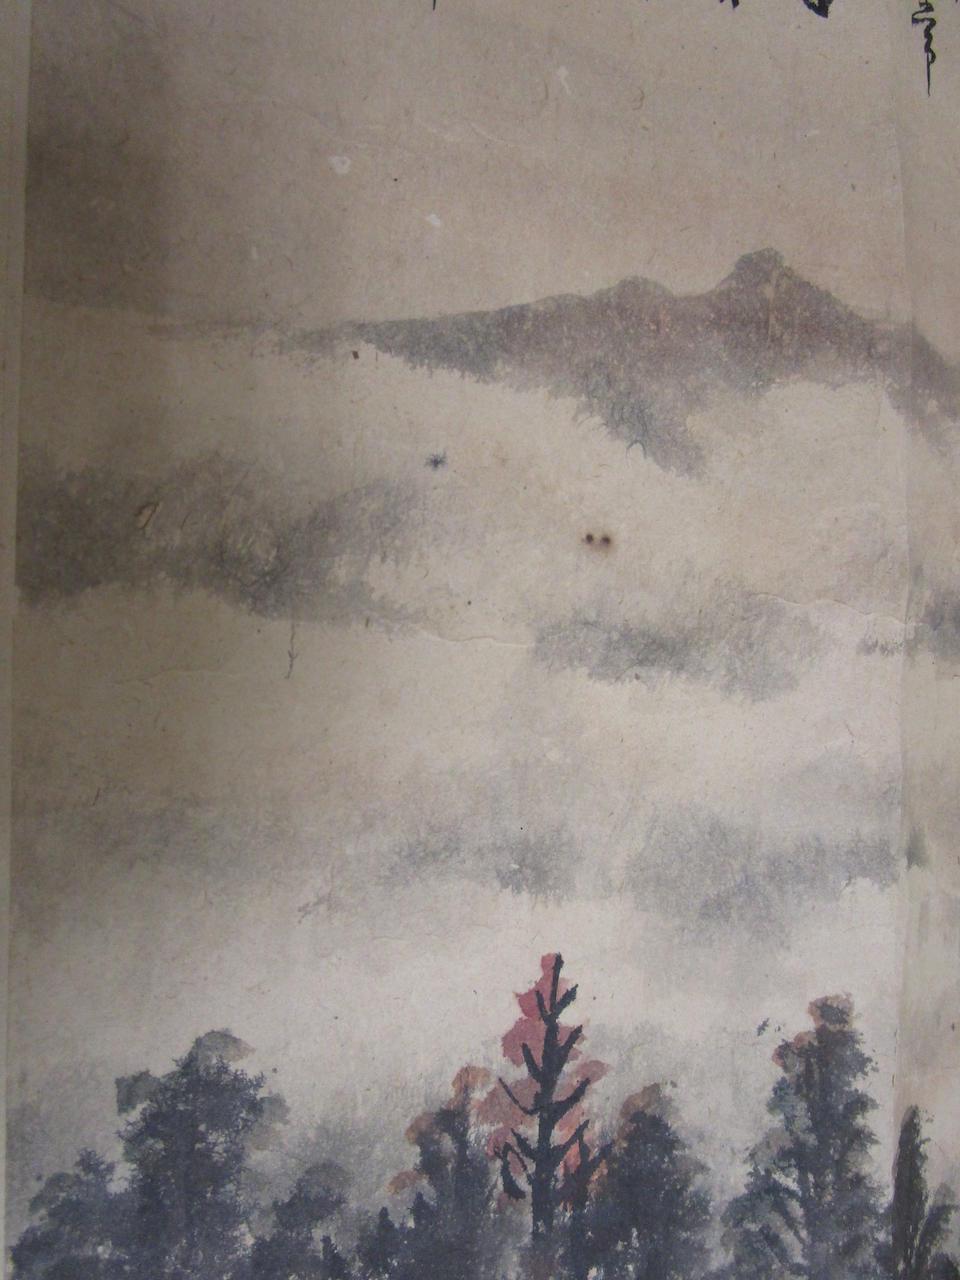 Huang Junbi (1889-1991) Landscape with Waterfall, 1971